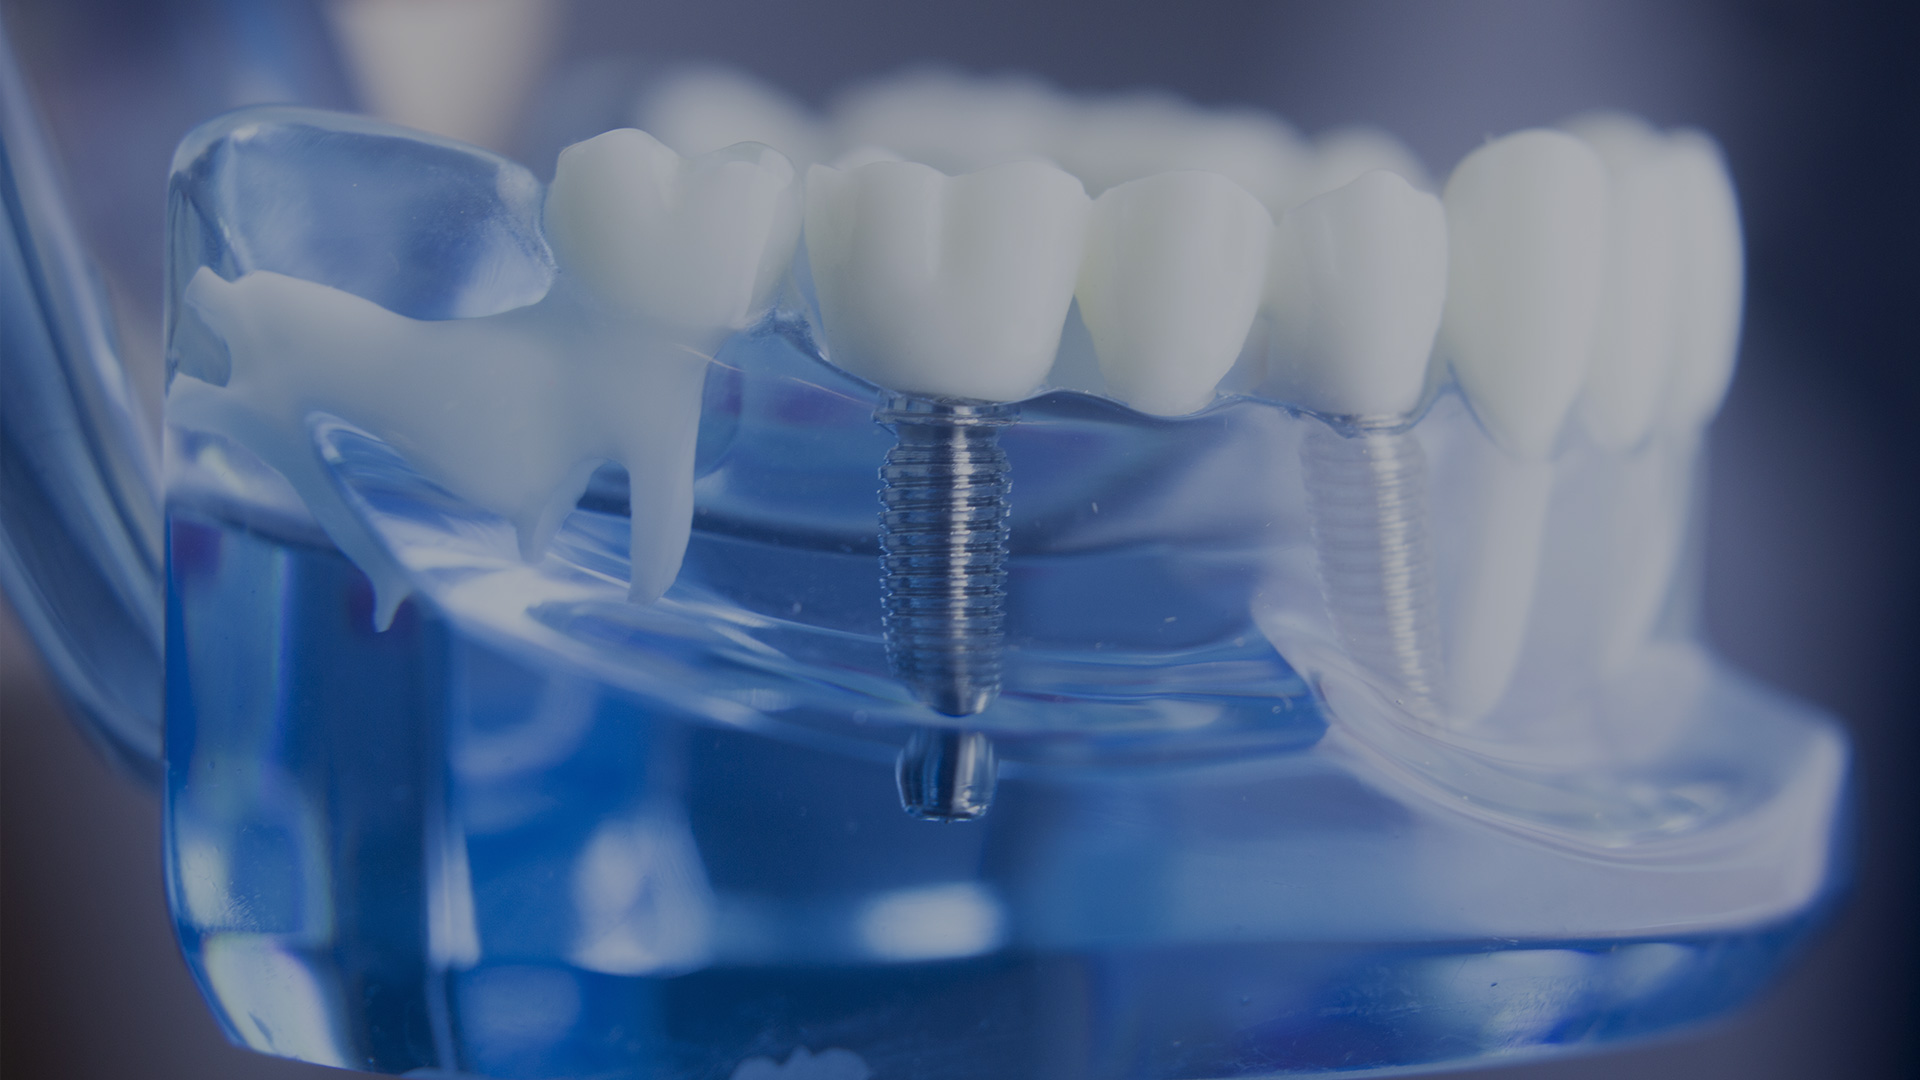 Solución Dental - Odontolgía estética especializada - Aclaram